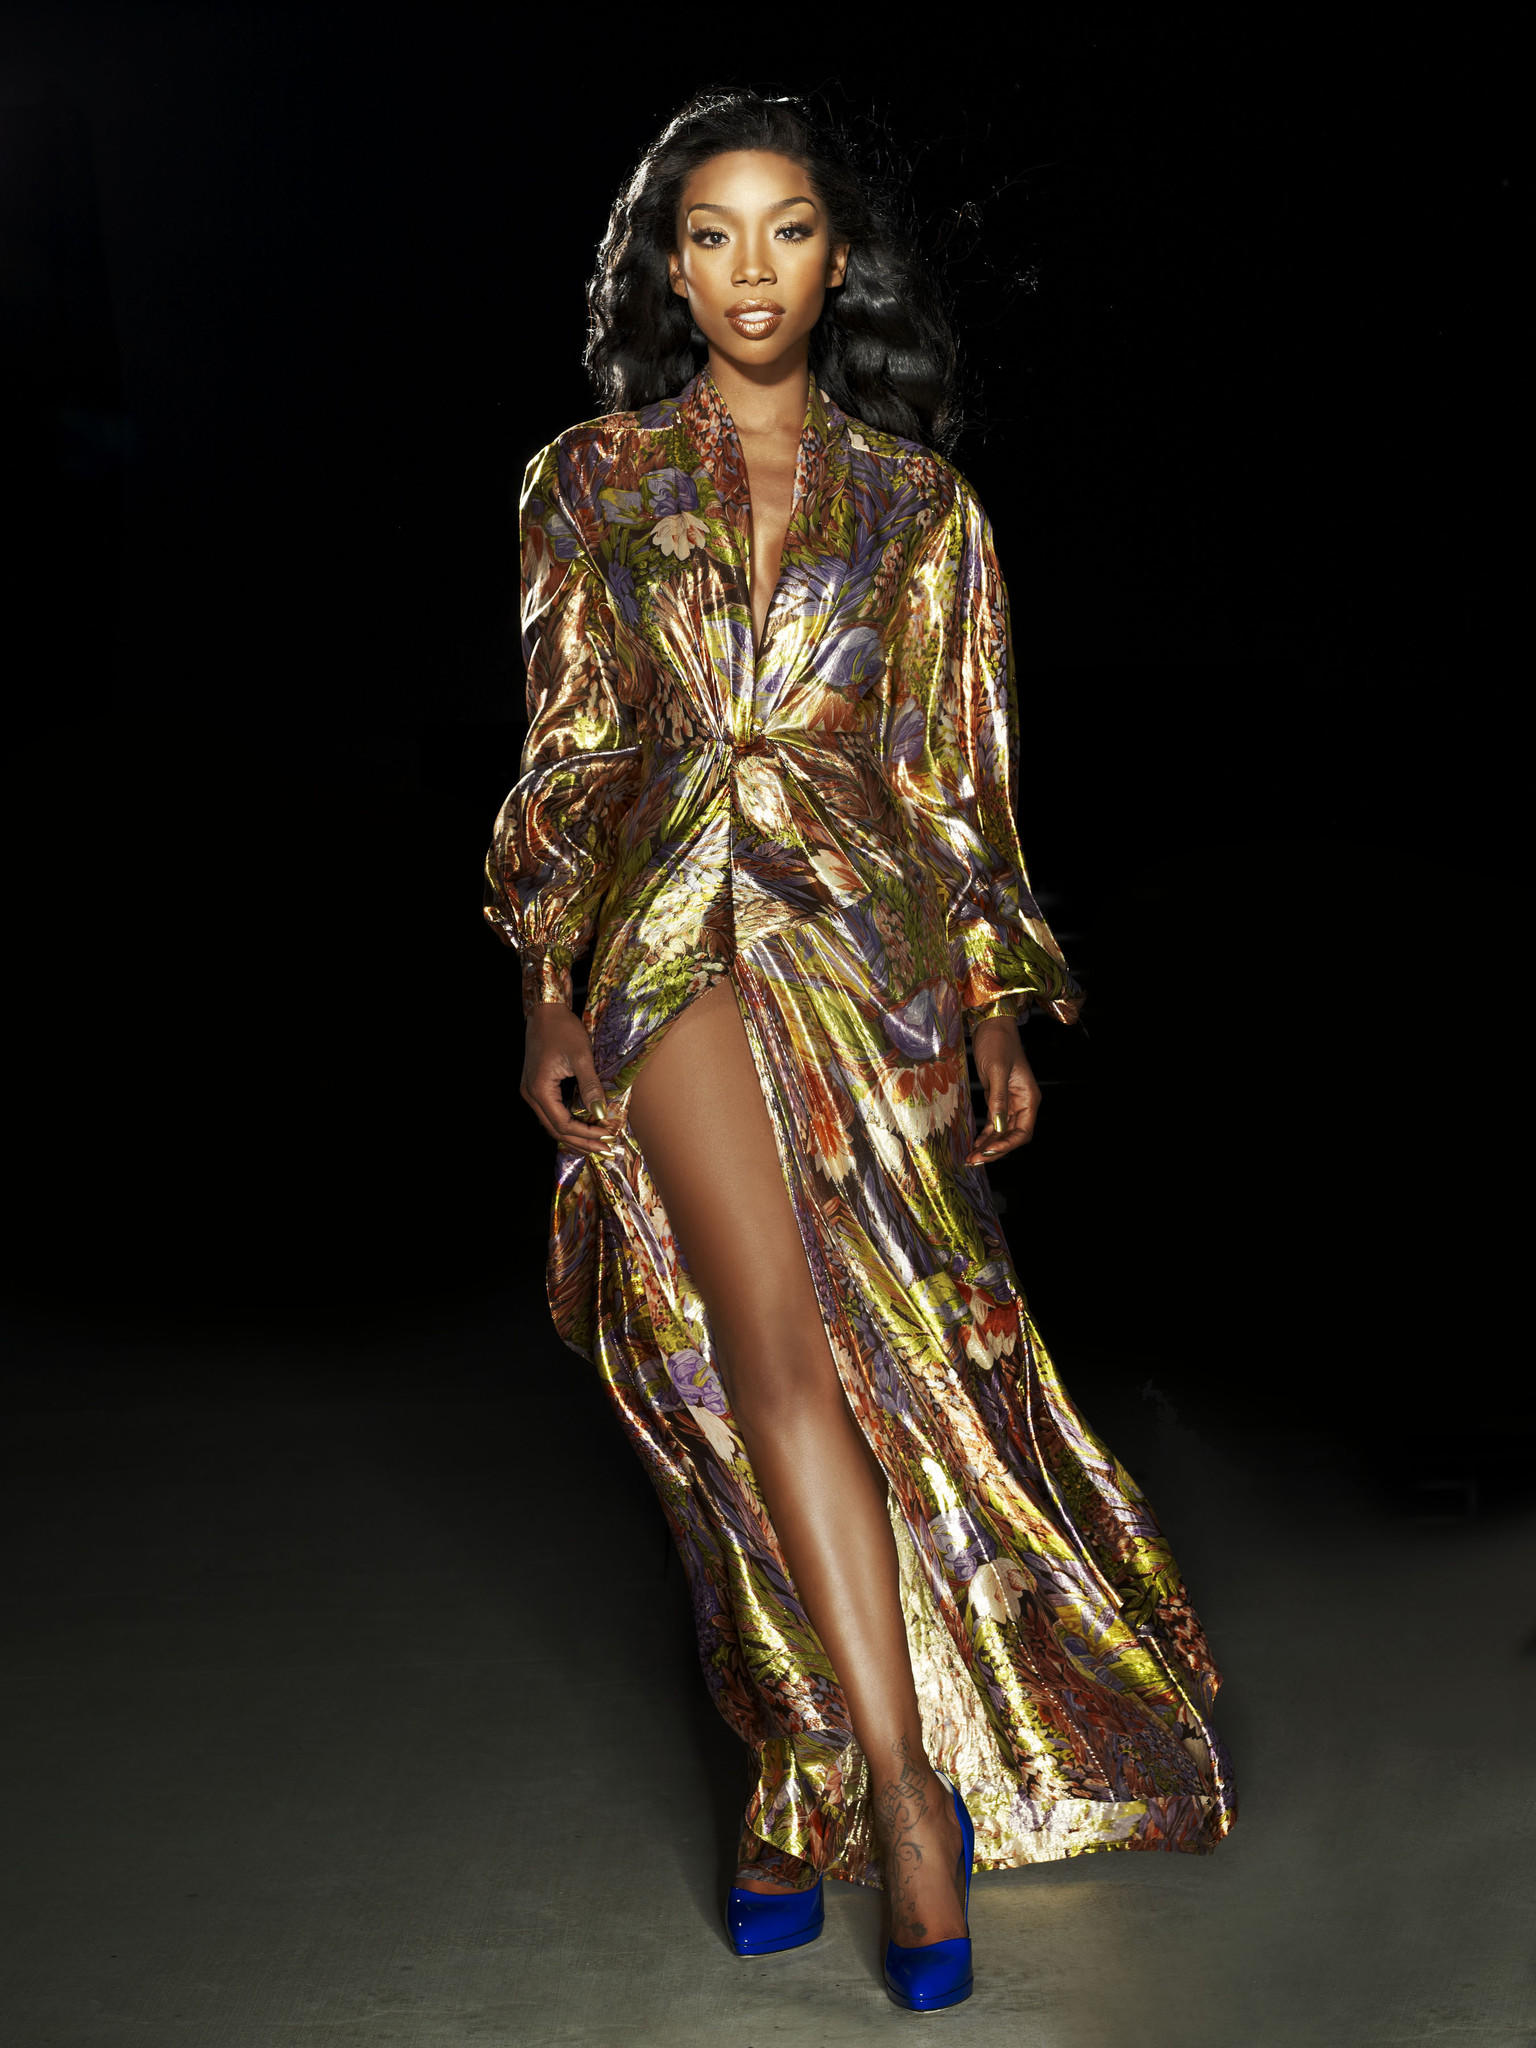 R&B singer Brandy will headline Baltimore's African American Festival.